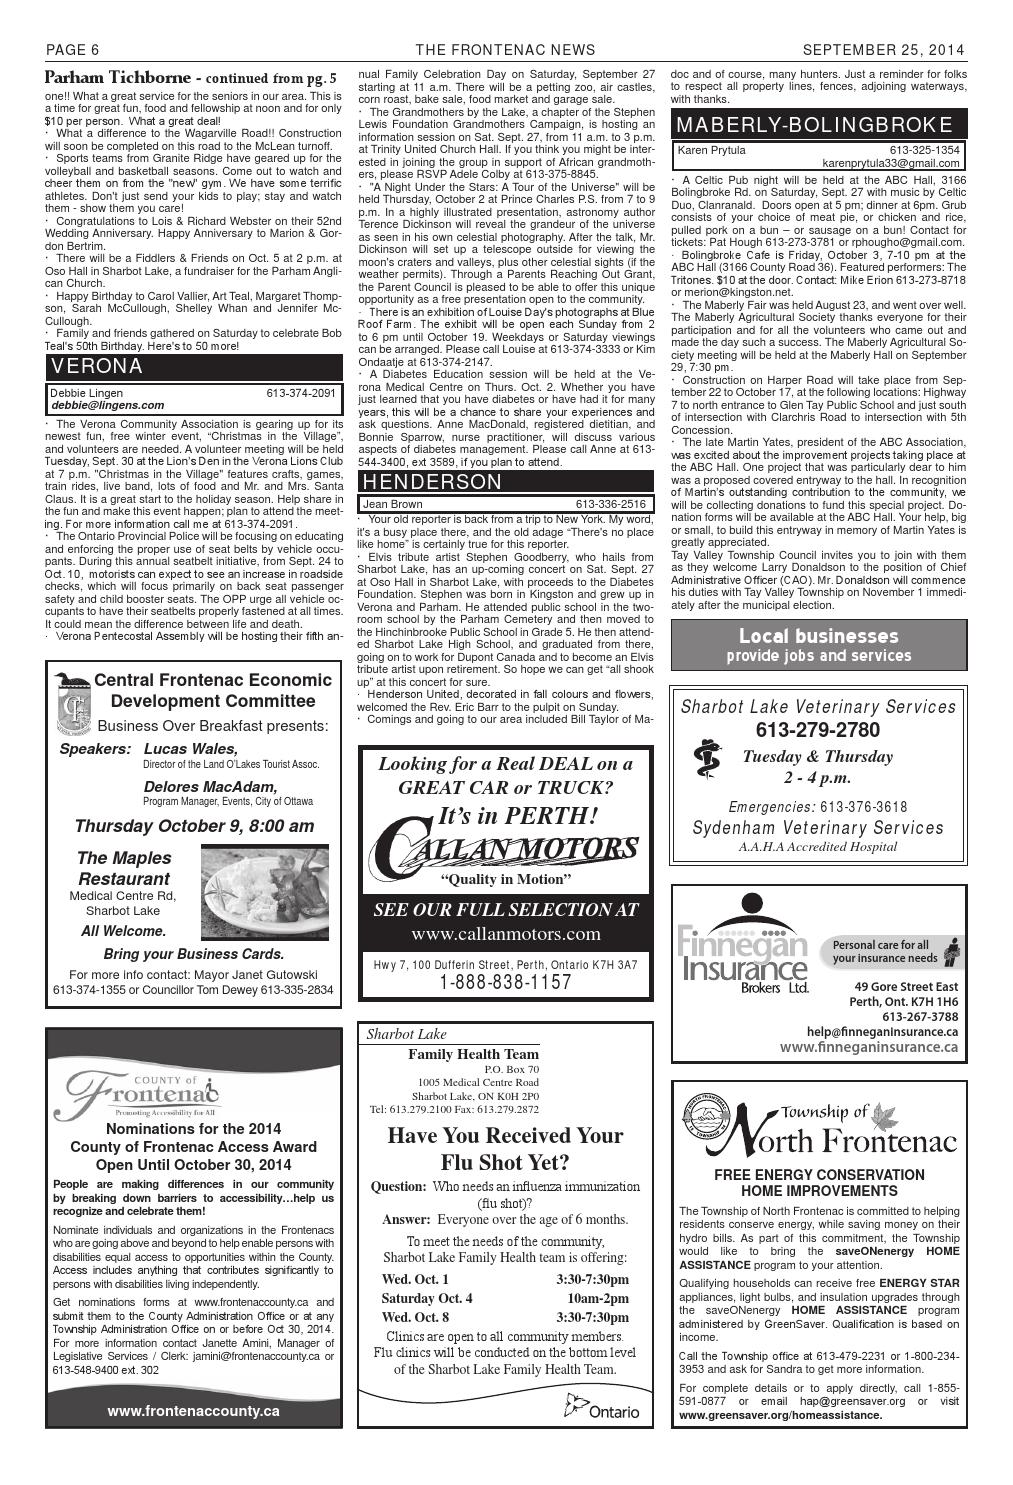 No 14 Vol 38 by Frontenac News - issuu